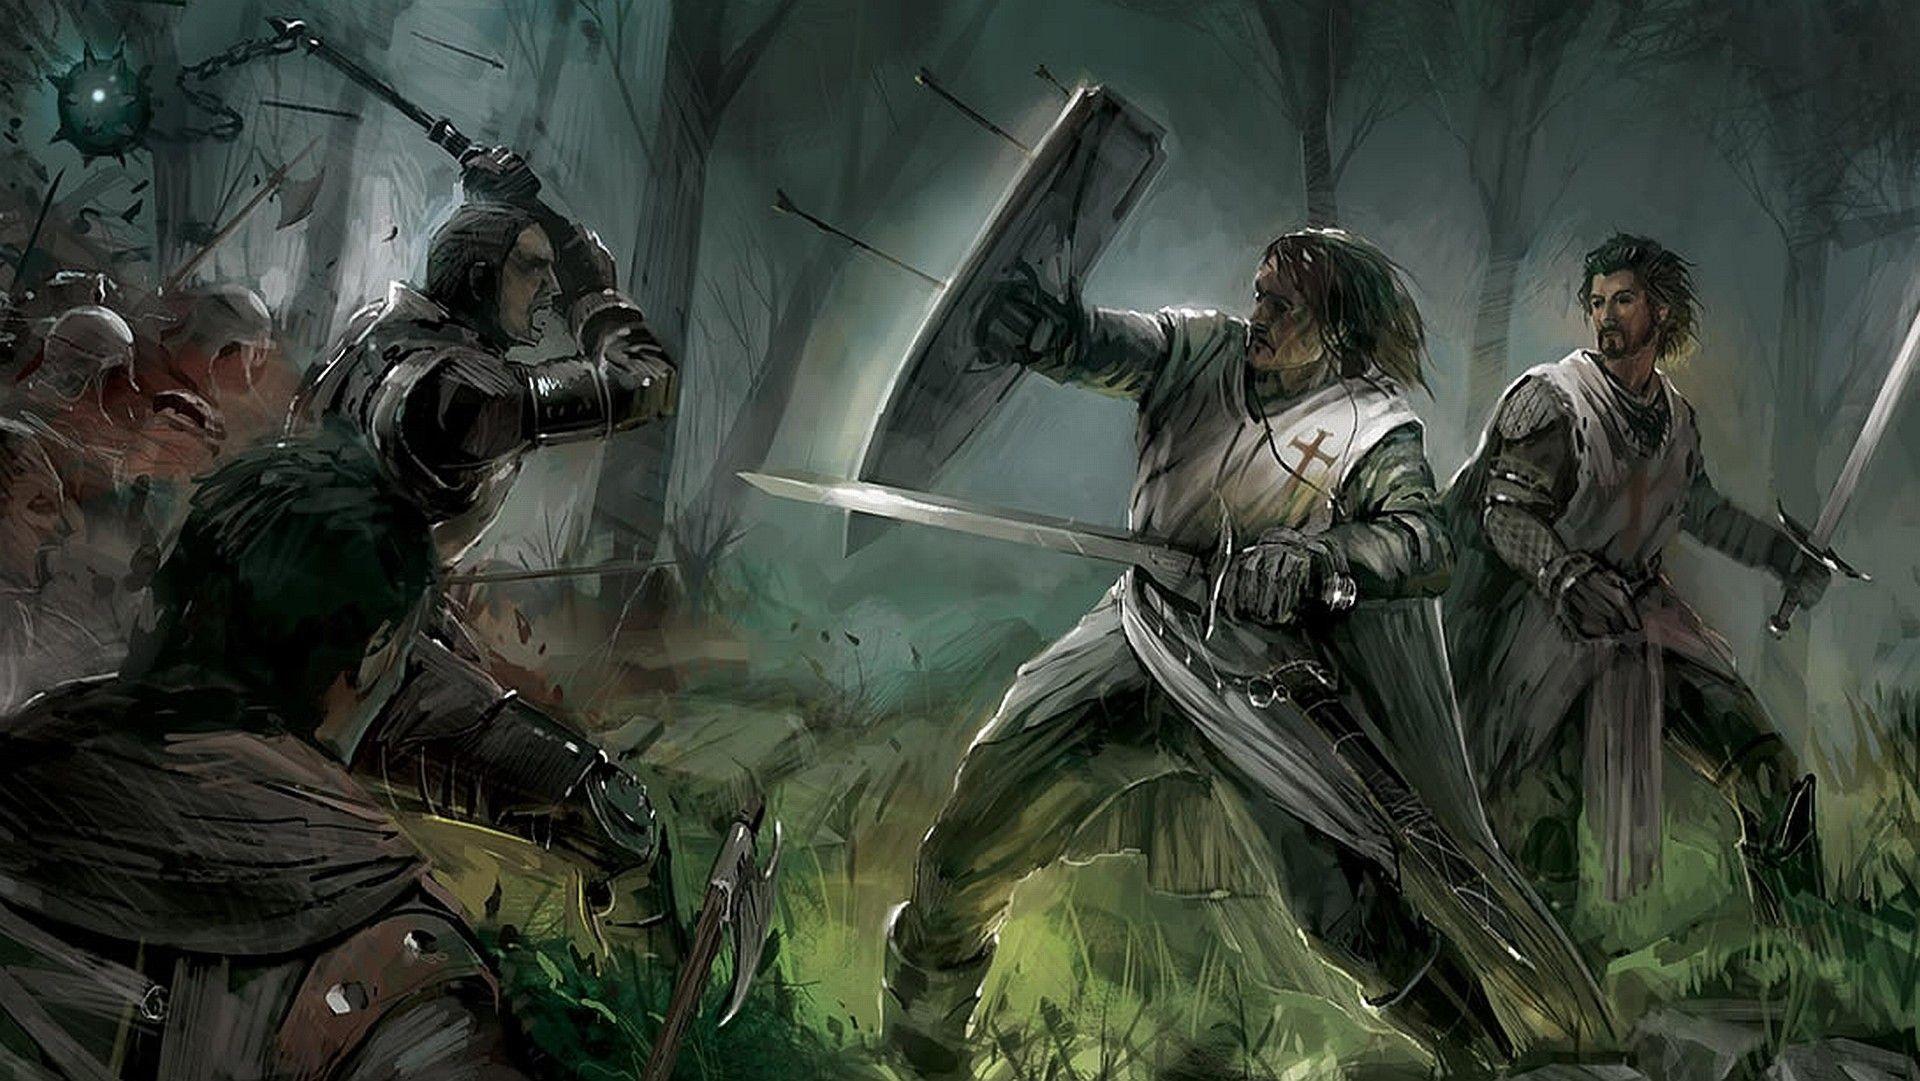 fight, knights, warriors, Templars, medieval :: Wallpapers